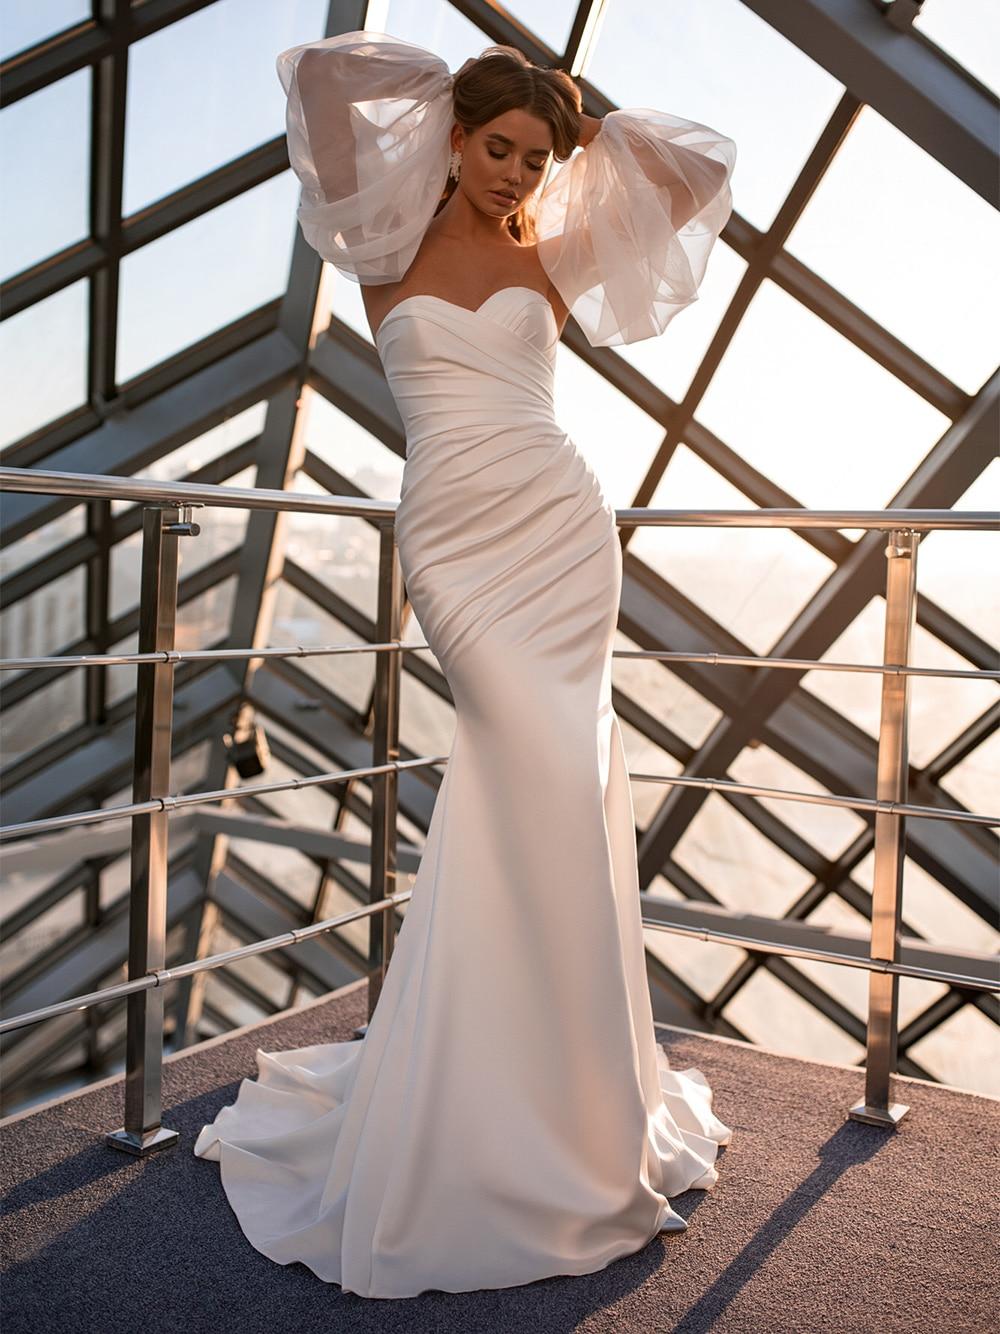 2021 Classic Wedding Dresses Mermaid White Sweetheart Strapless Satin Bridal Gown Puffy Sleeves Crisscross Custom Made 2021